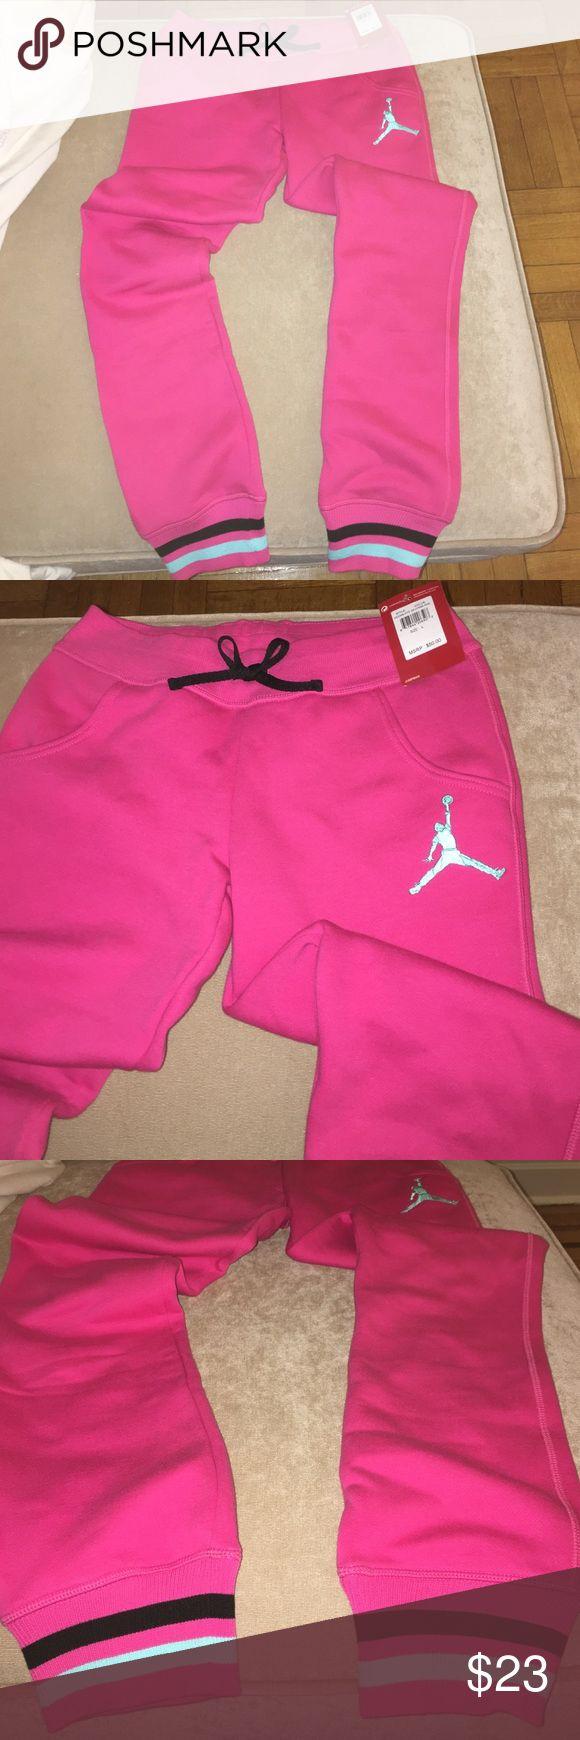 Pink Jordan sweatpants Brand new with the tags on! Pink Jordan sweatpants with teal jumpman. Cotton material. Jordan Pants Track Pants & Joggers